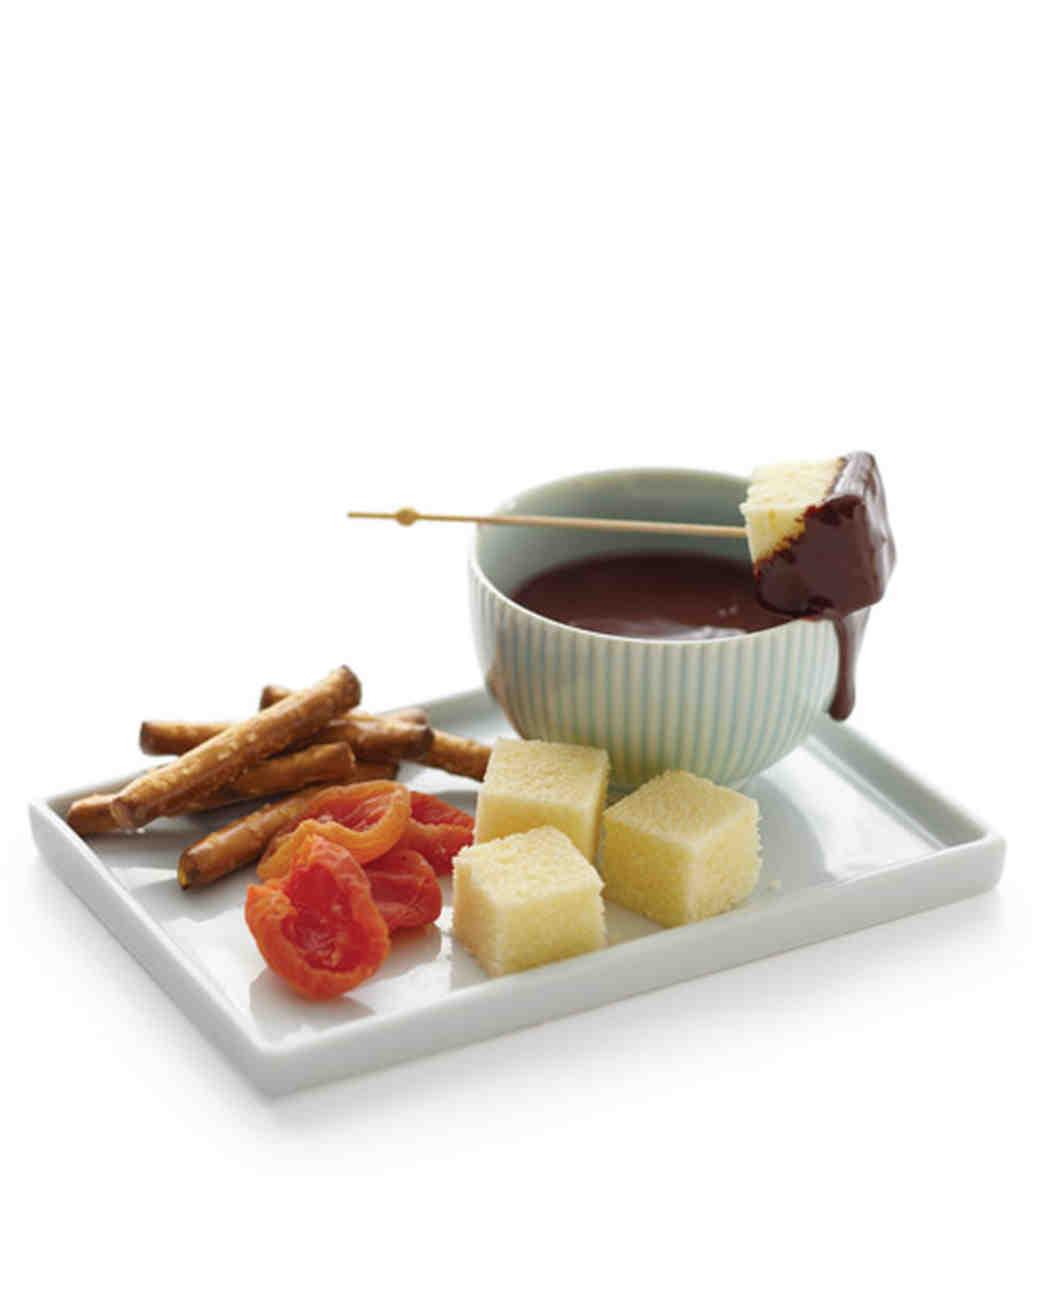 mwd105786_fall10_fondue4.jpg